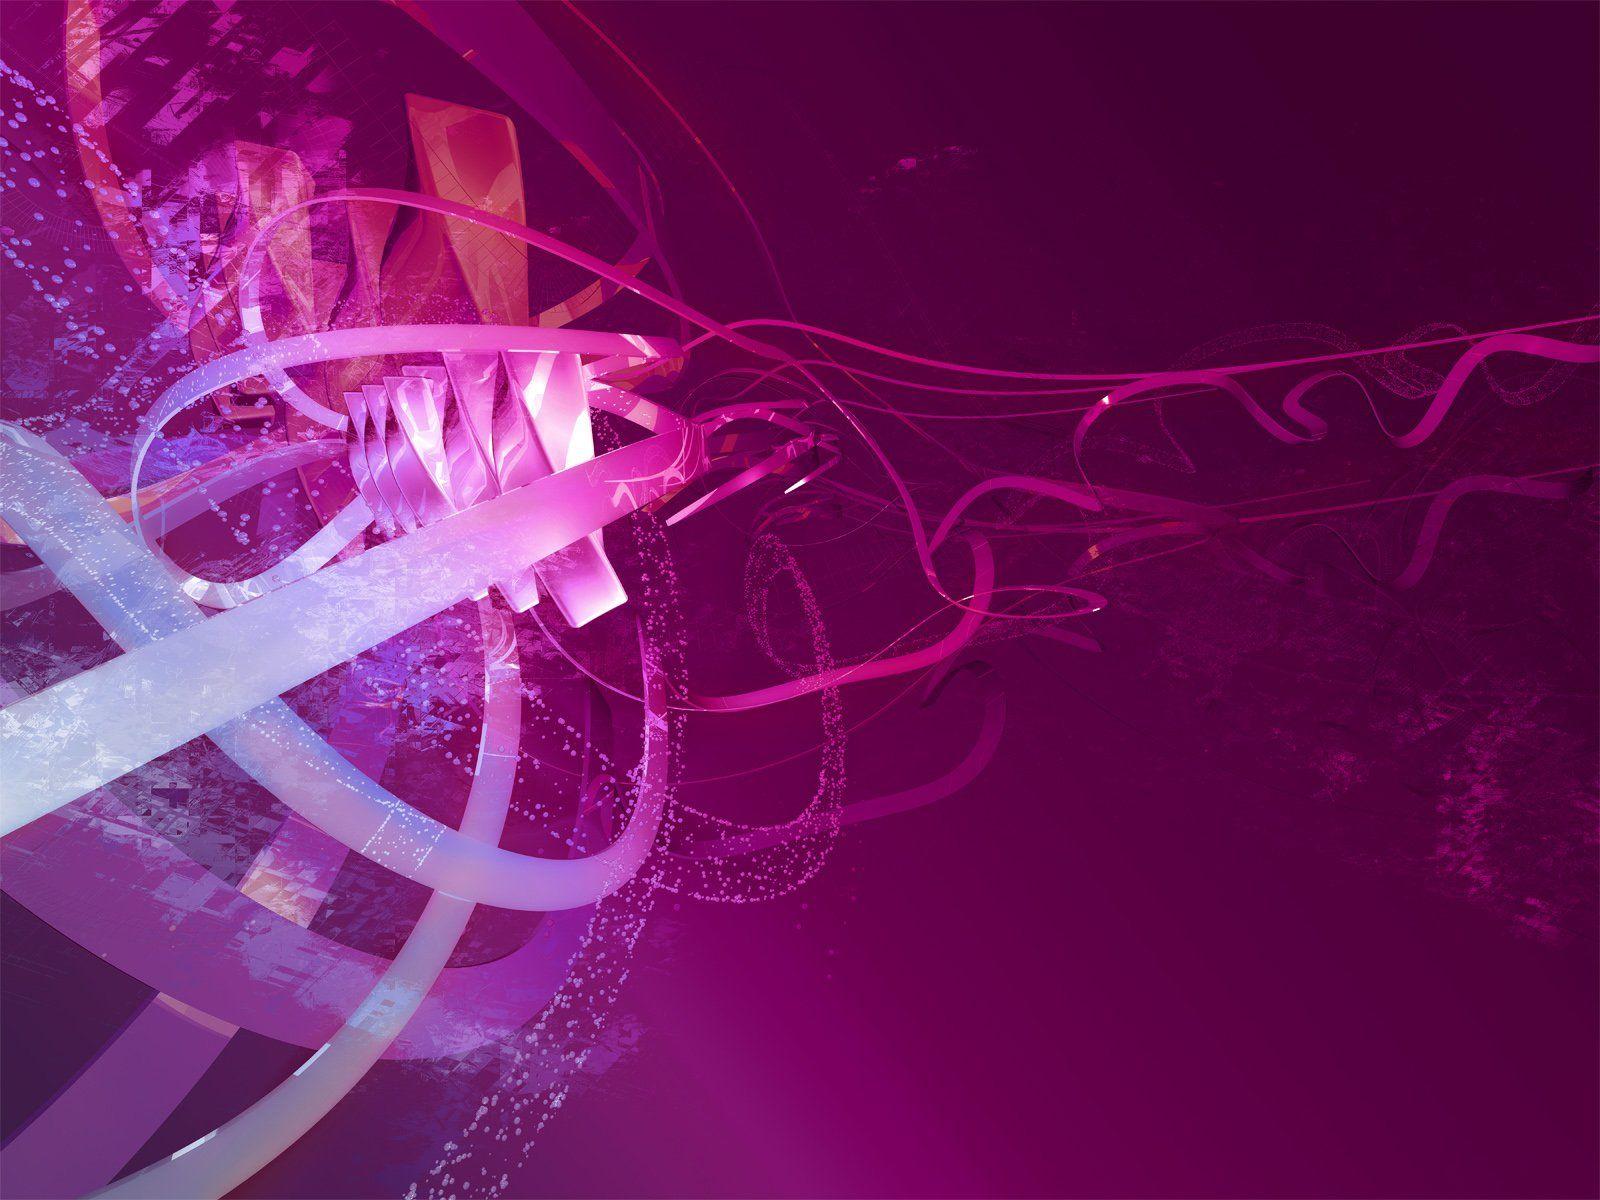 Purple | Purple crystallization, Wallpapers Metal Abstract: Heavy Metal ...